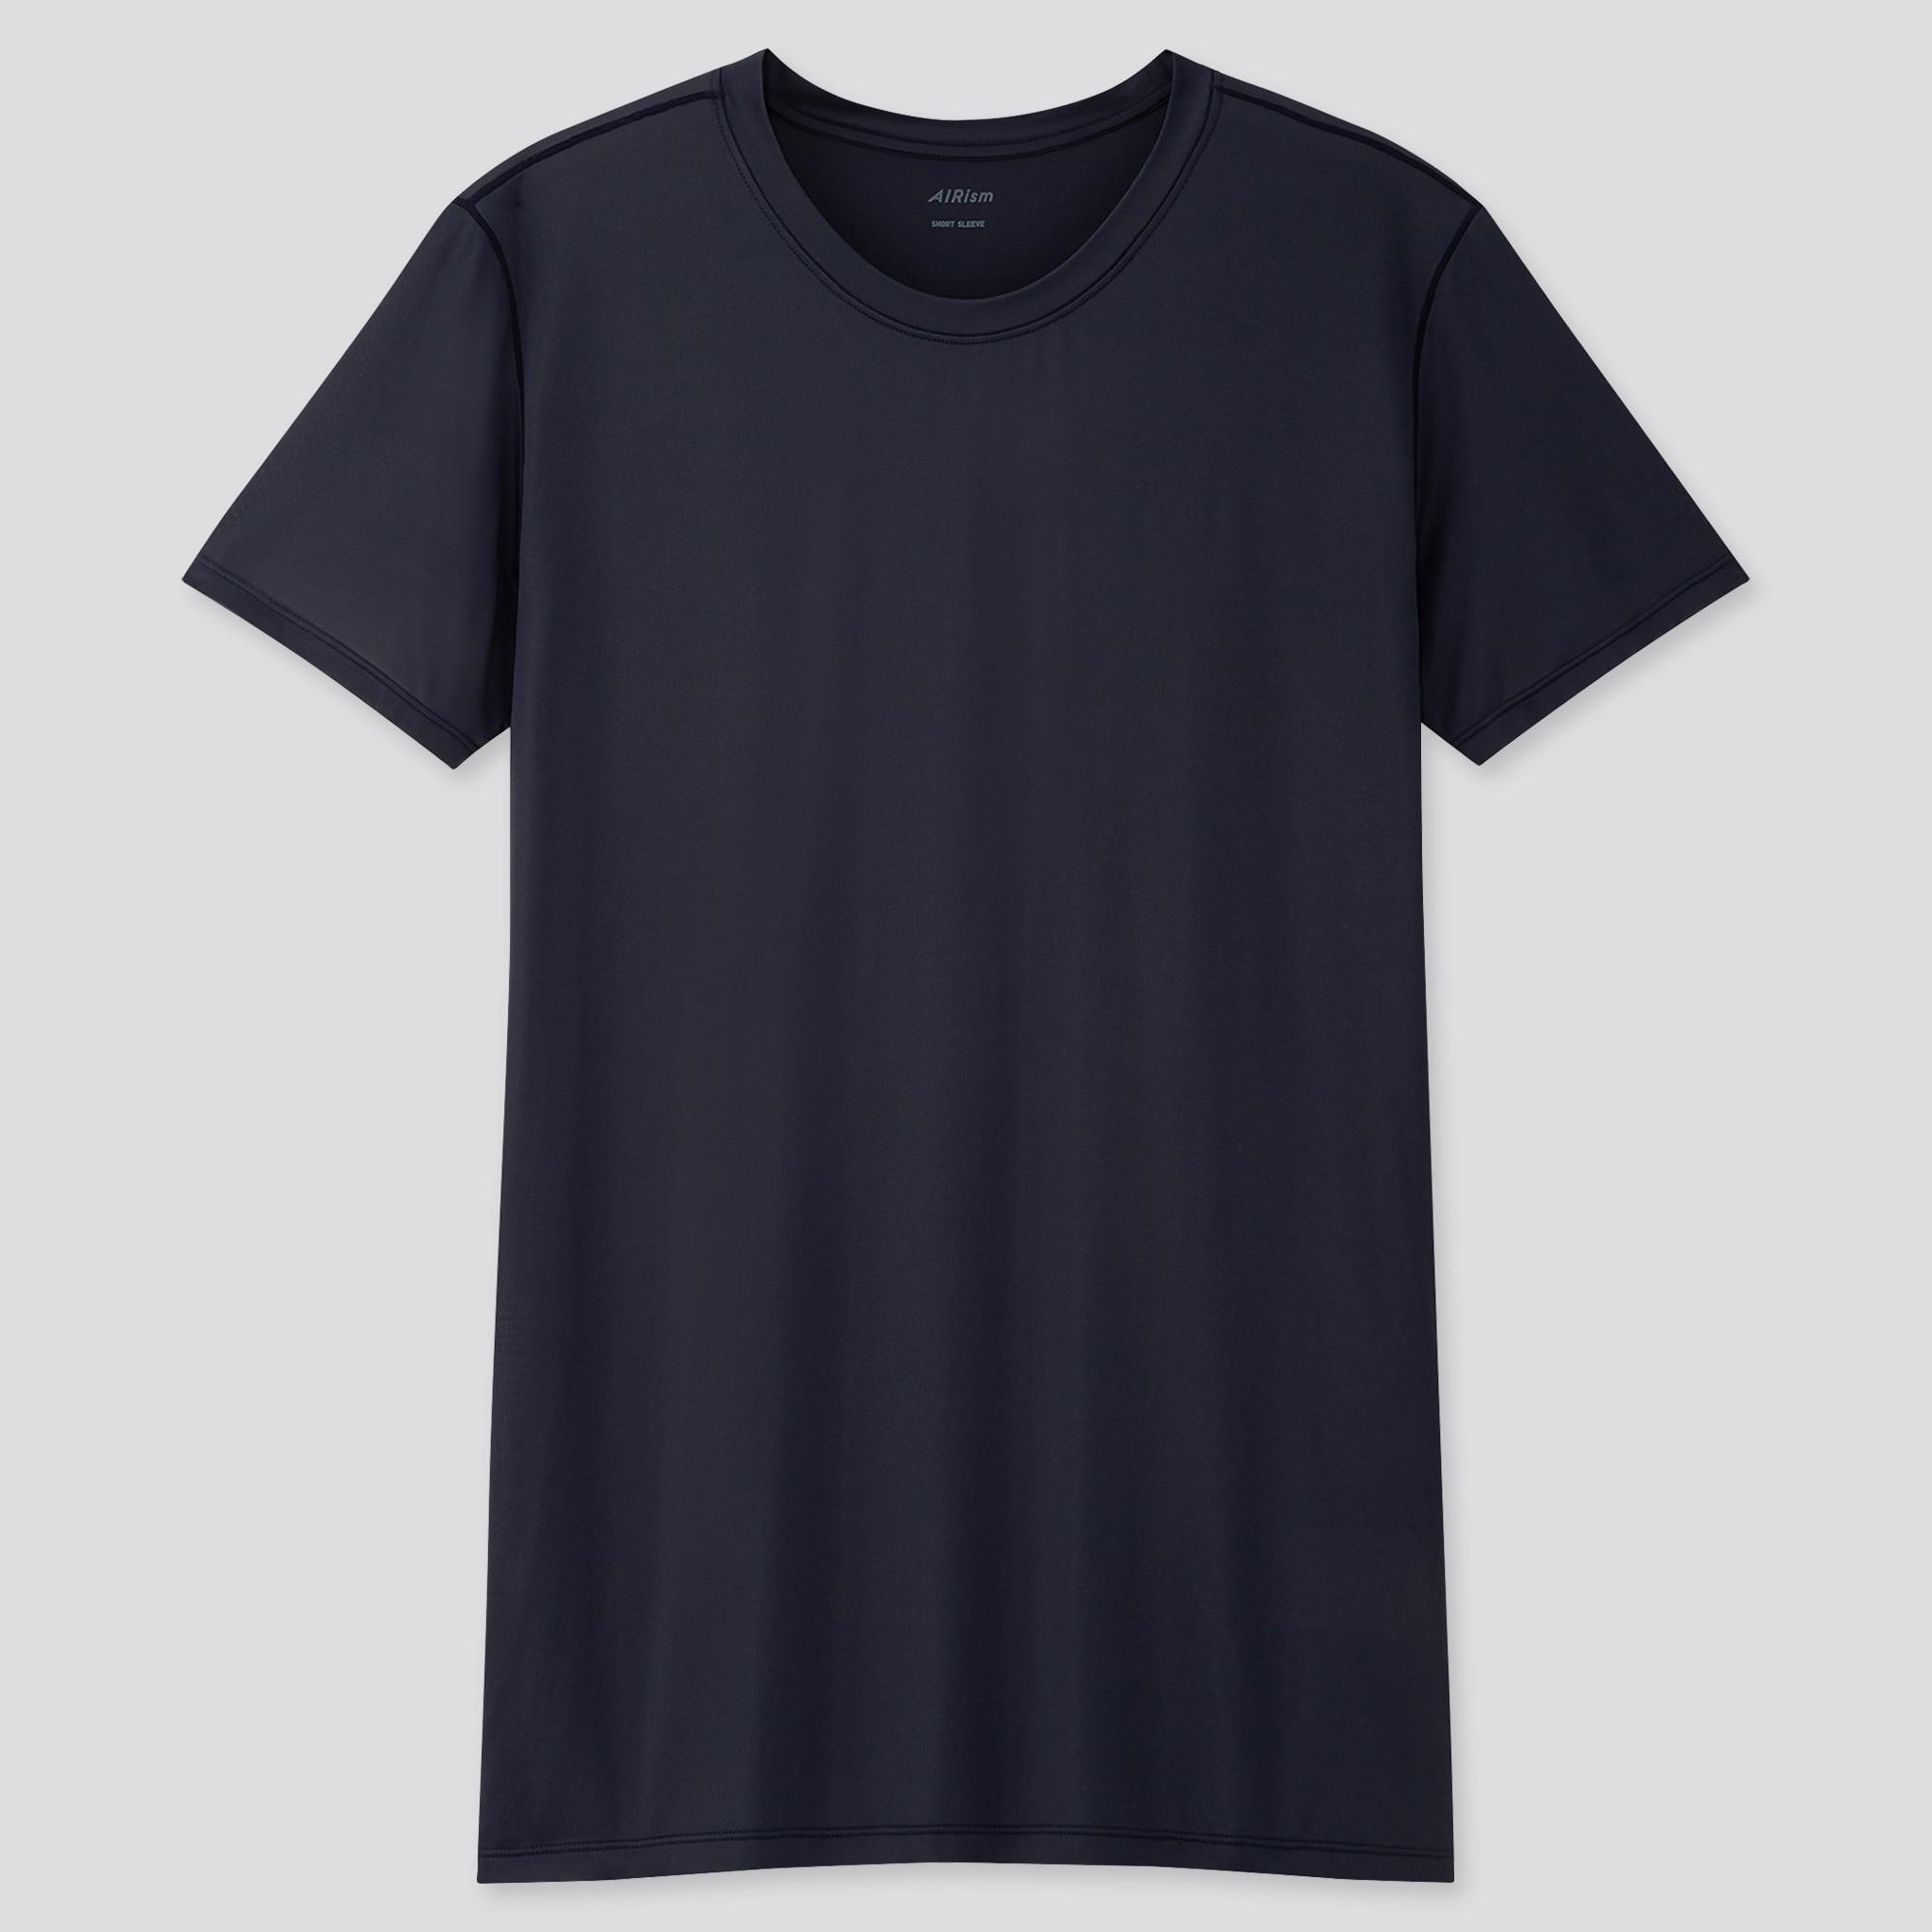 Uniqlo Men Airism Crew Neck Short-Sleeve T-Shirt in blue